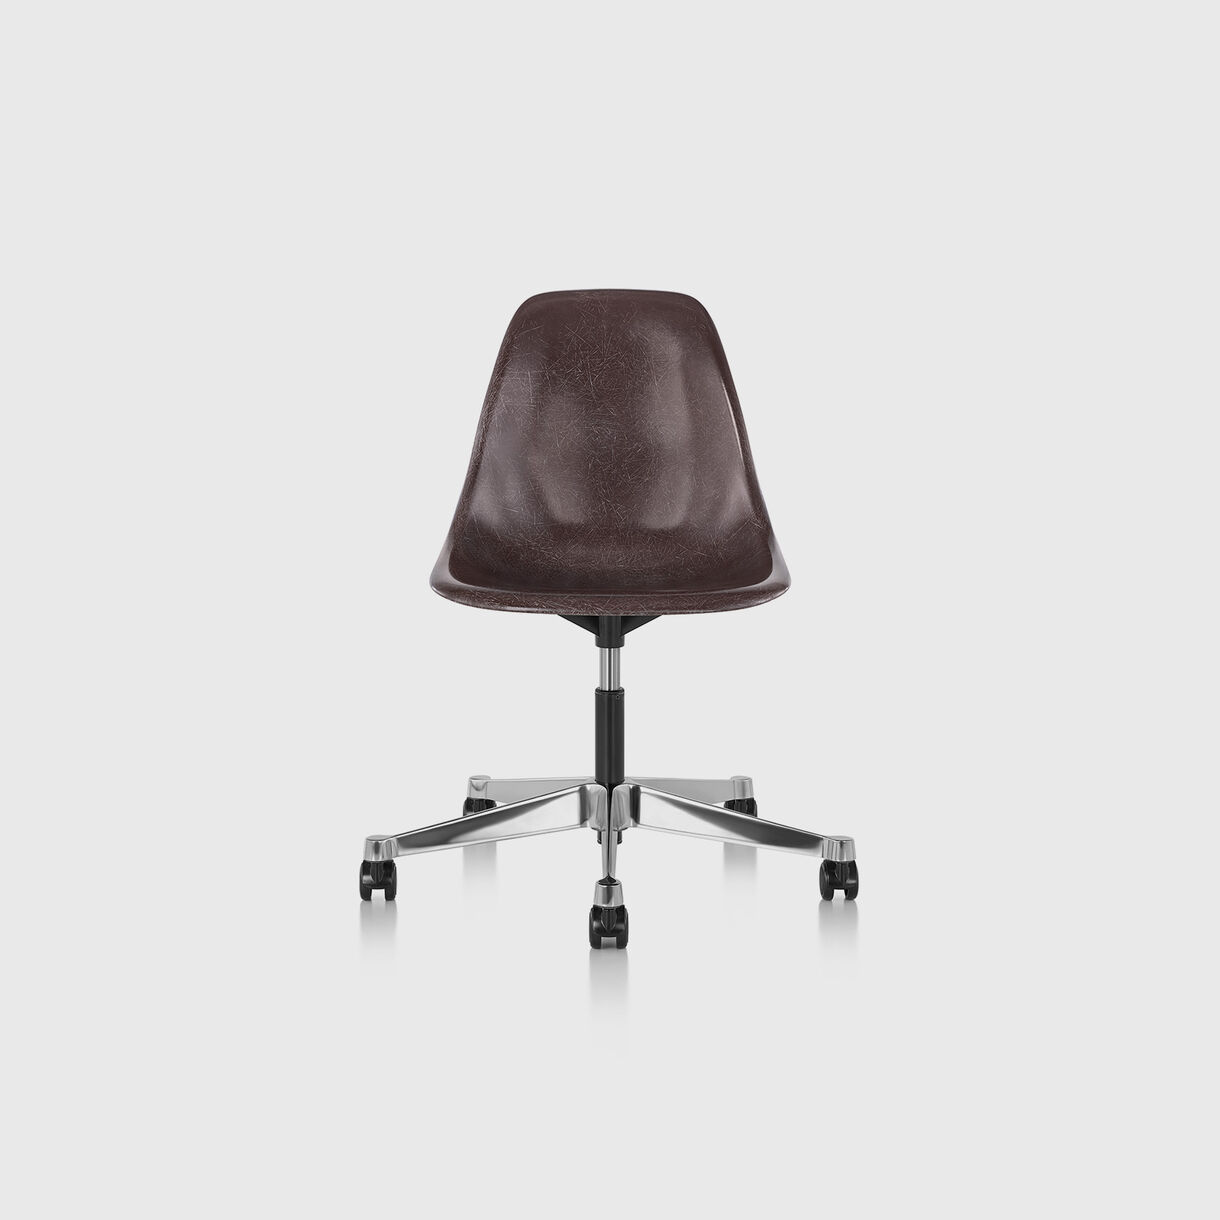 Eames Task Chair, Fiberglass